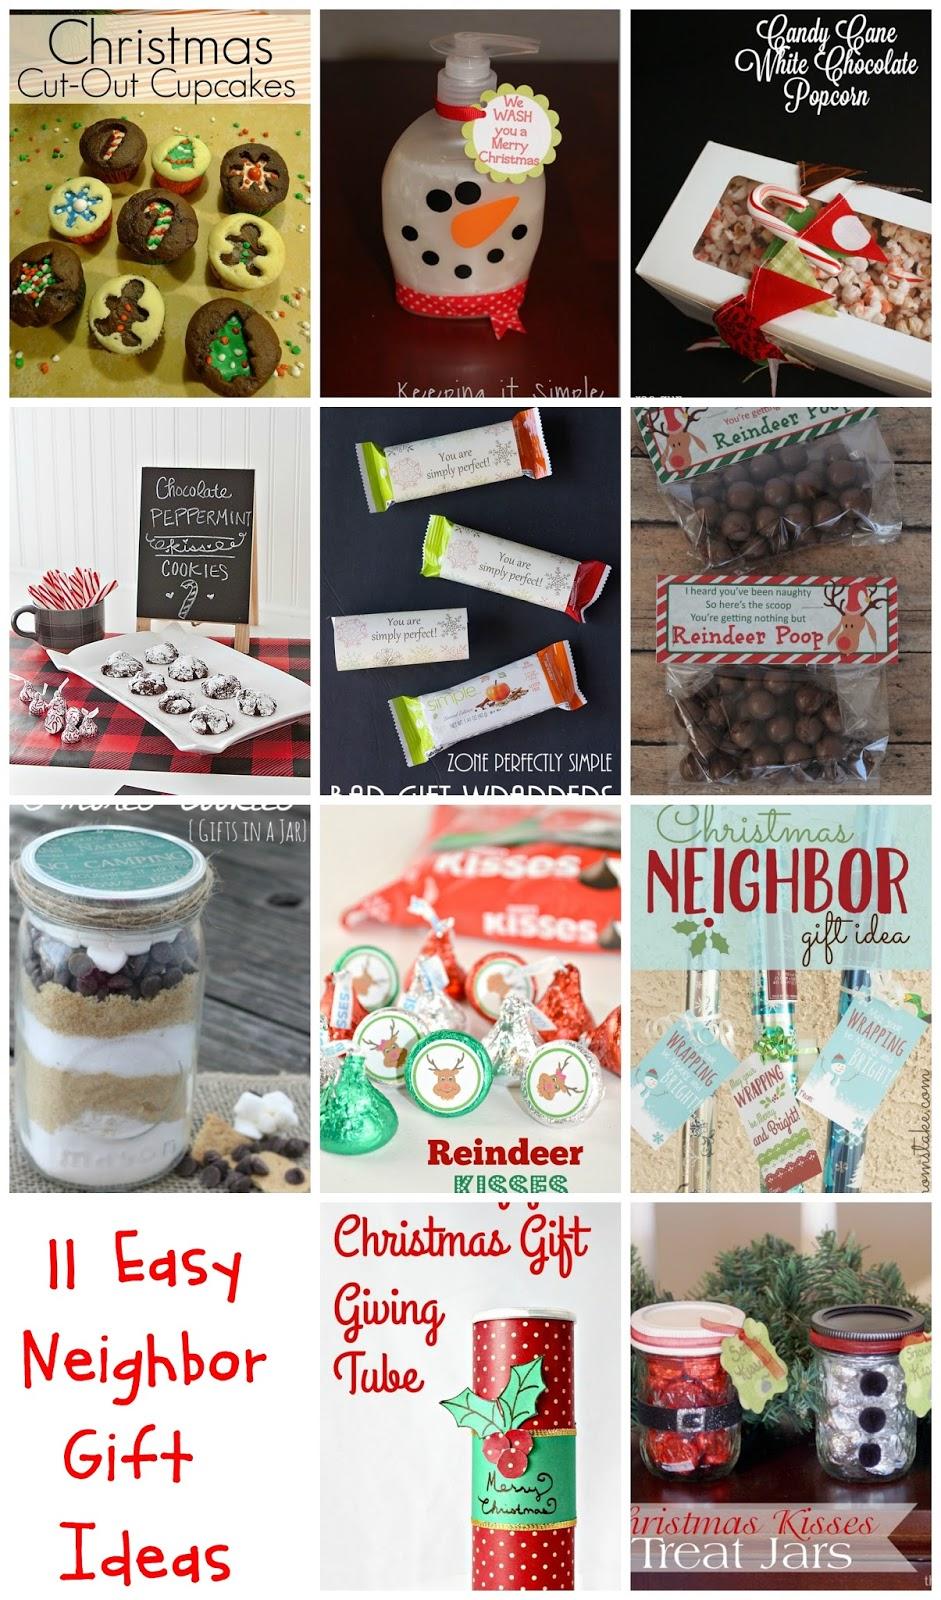 11 easy neighbor gift ideas